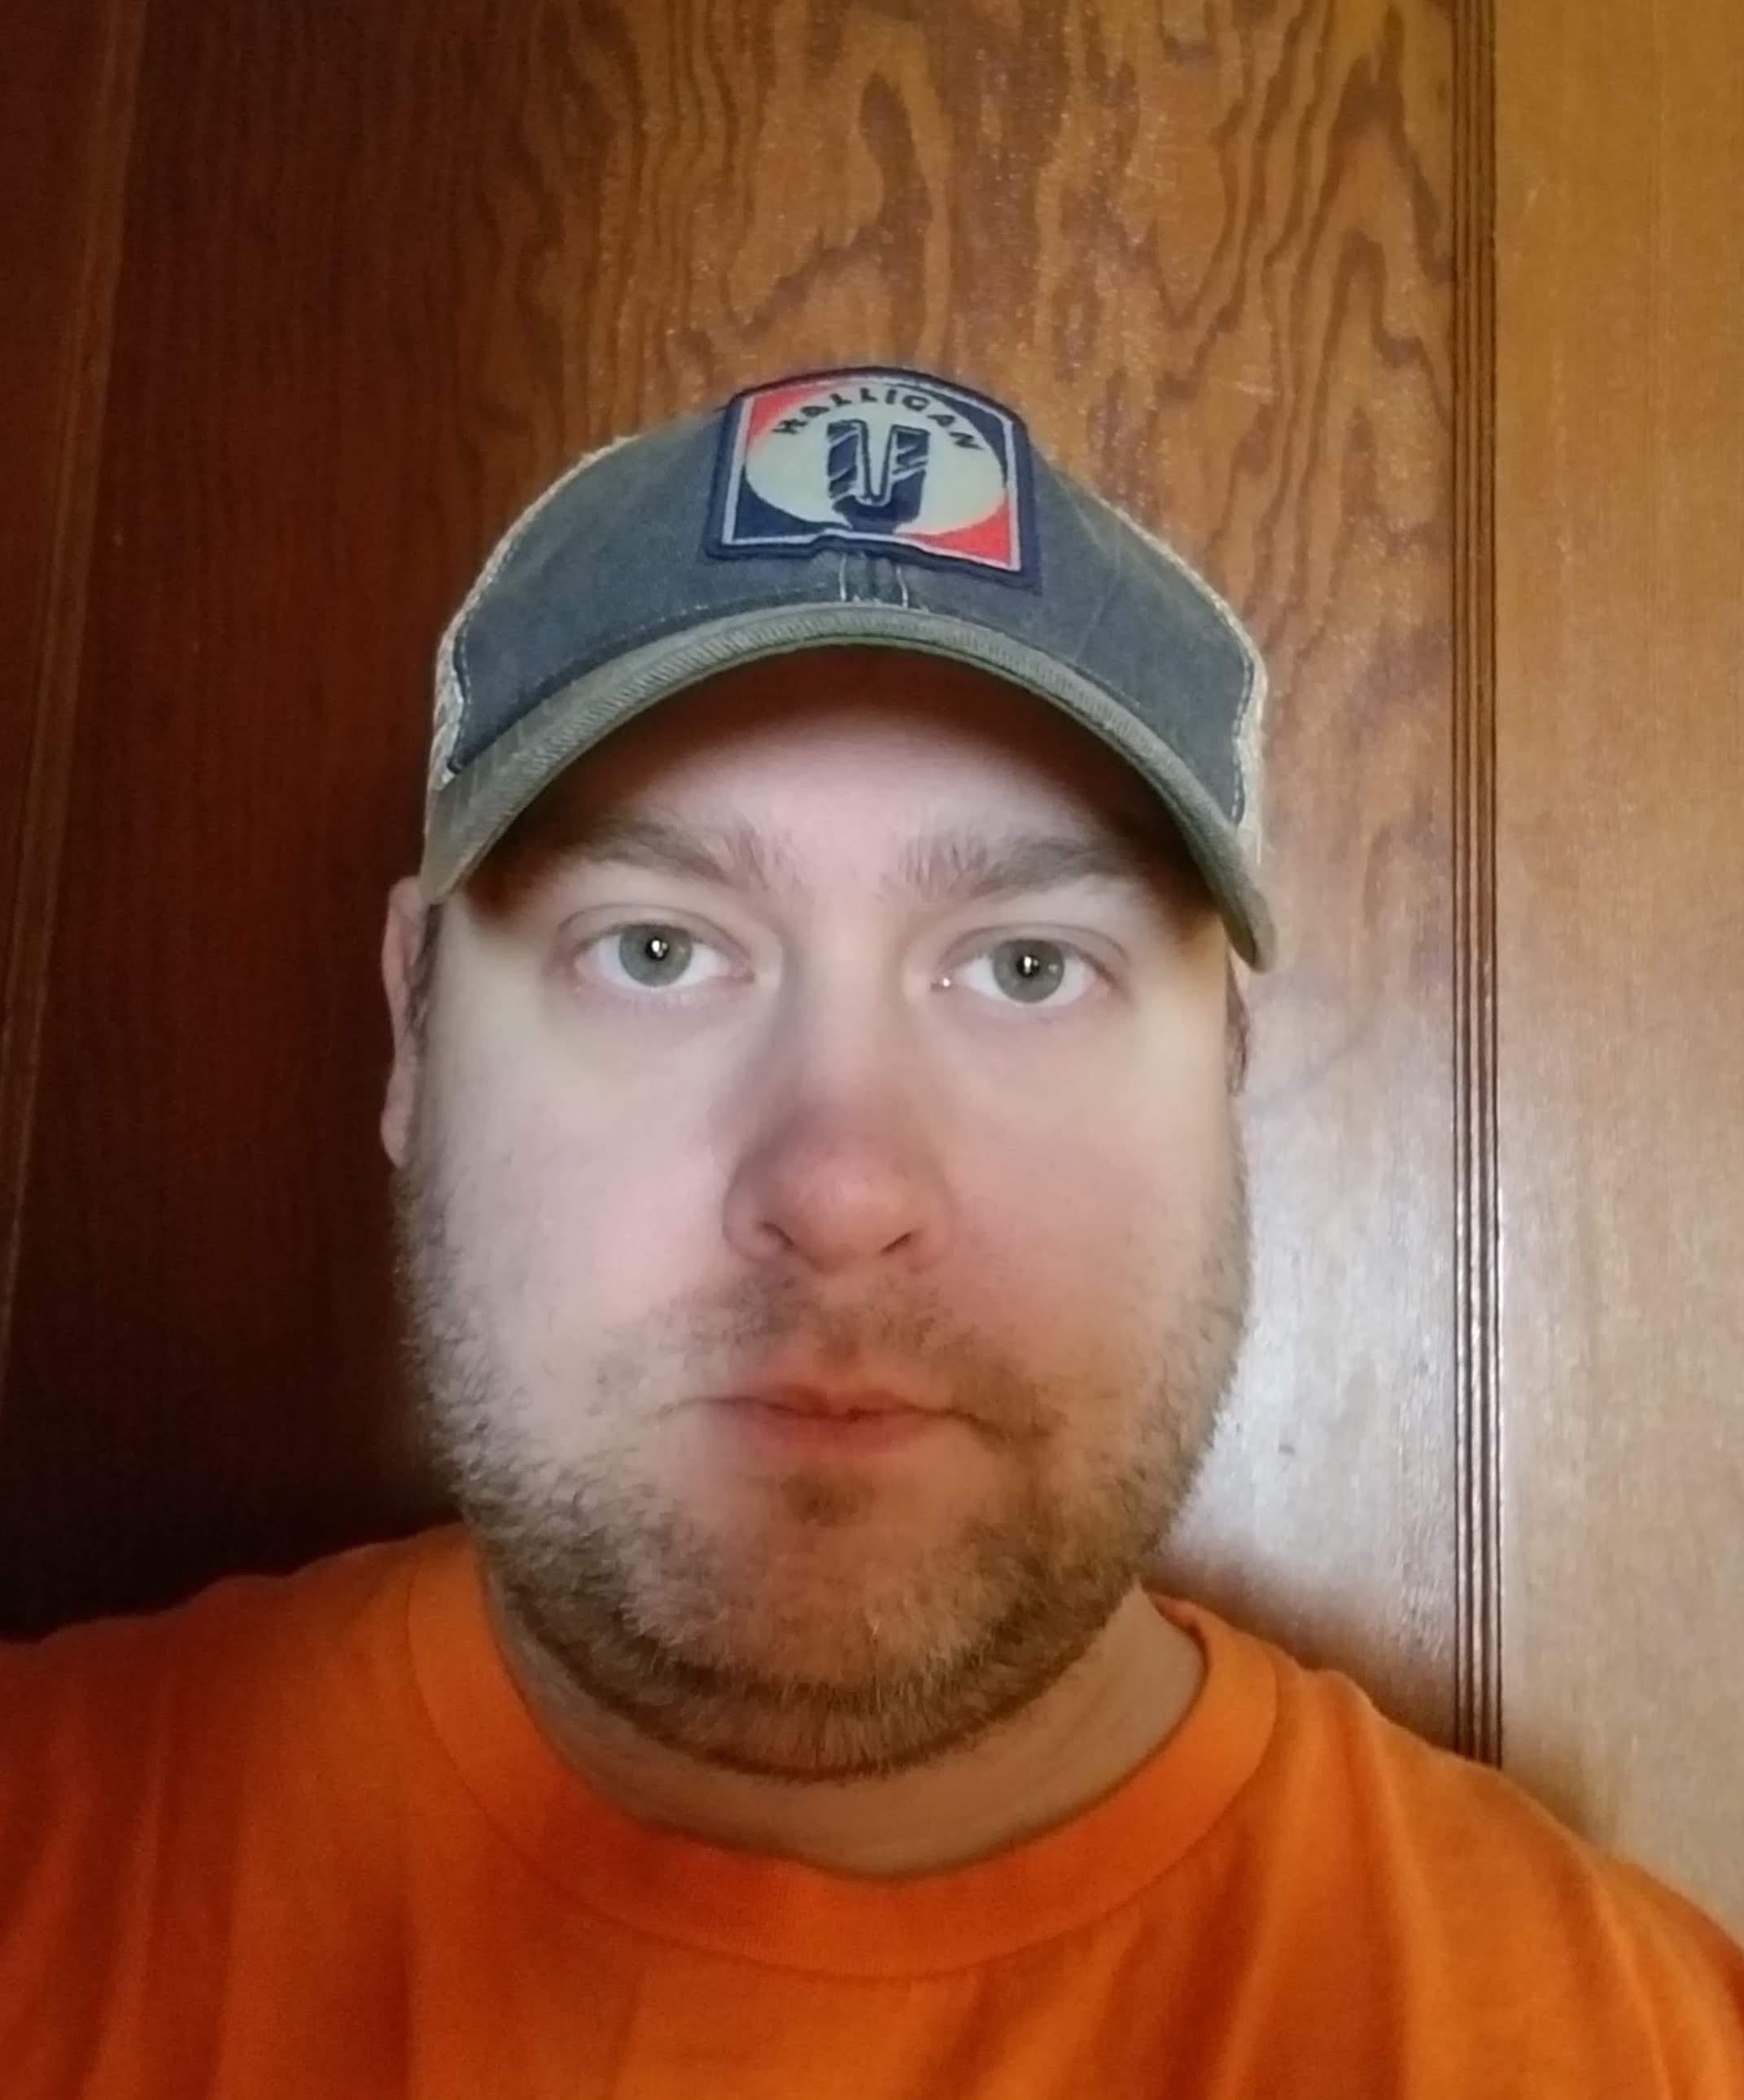 WELCOME to New Member MATTHEW HEDGE / Nebraska / April 27, 2019